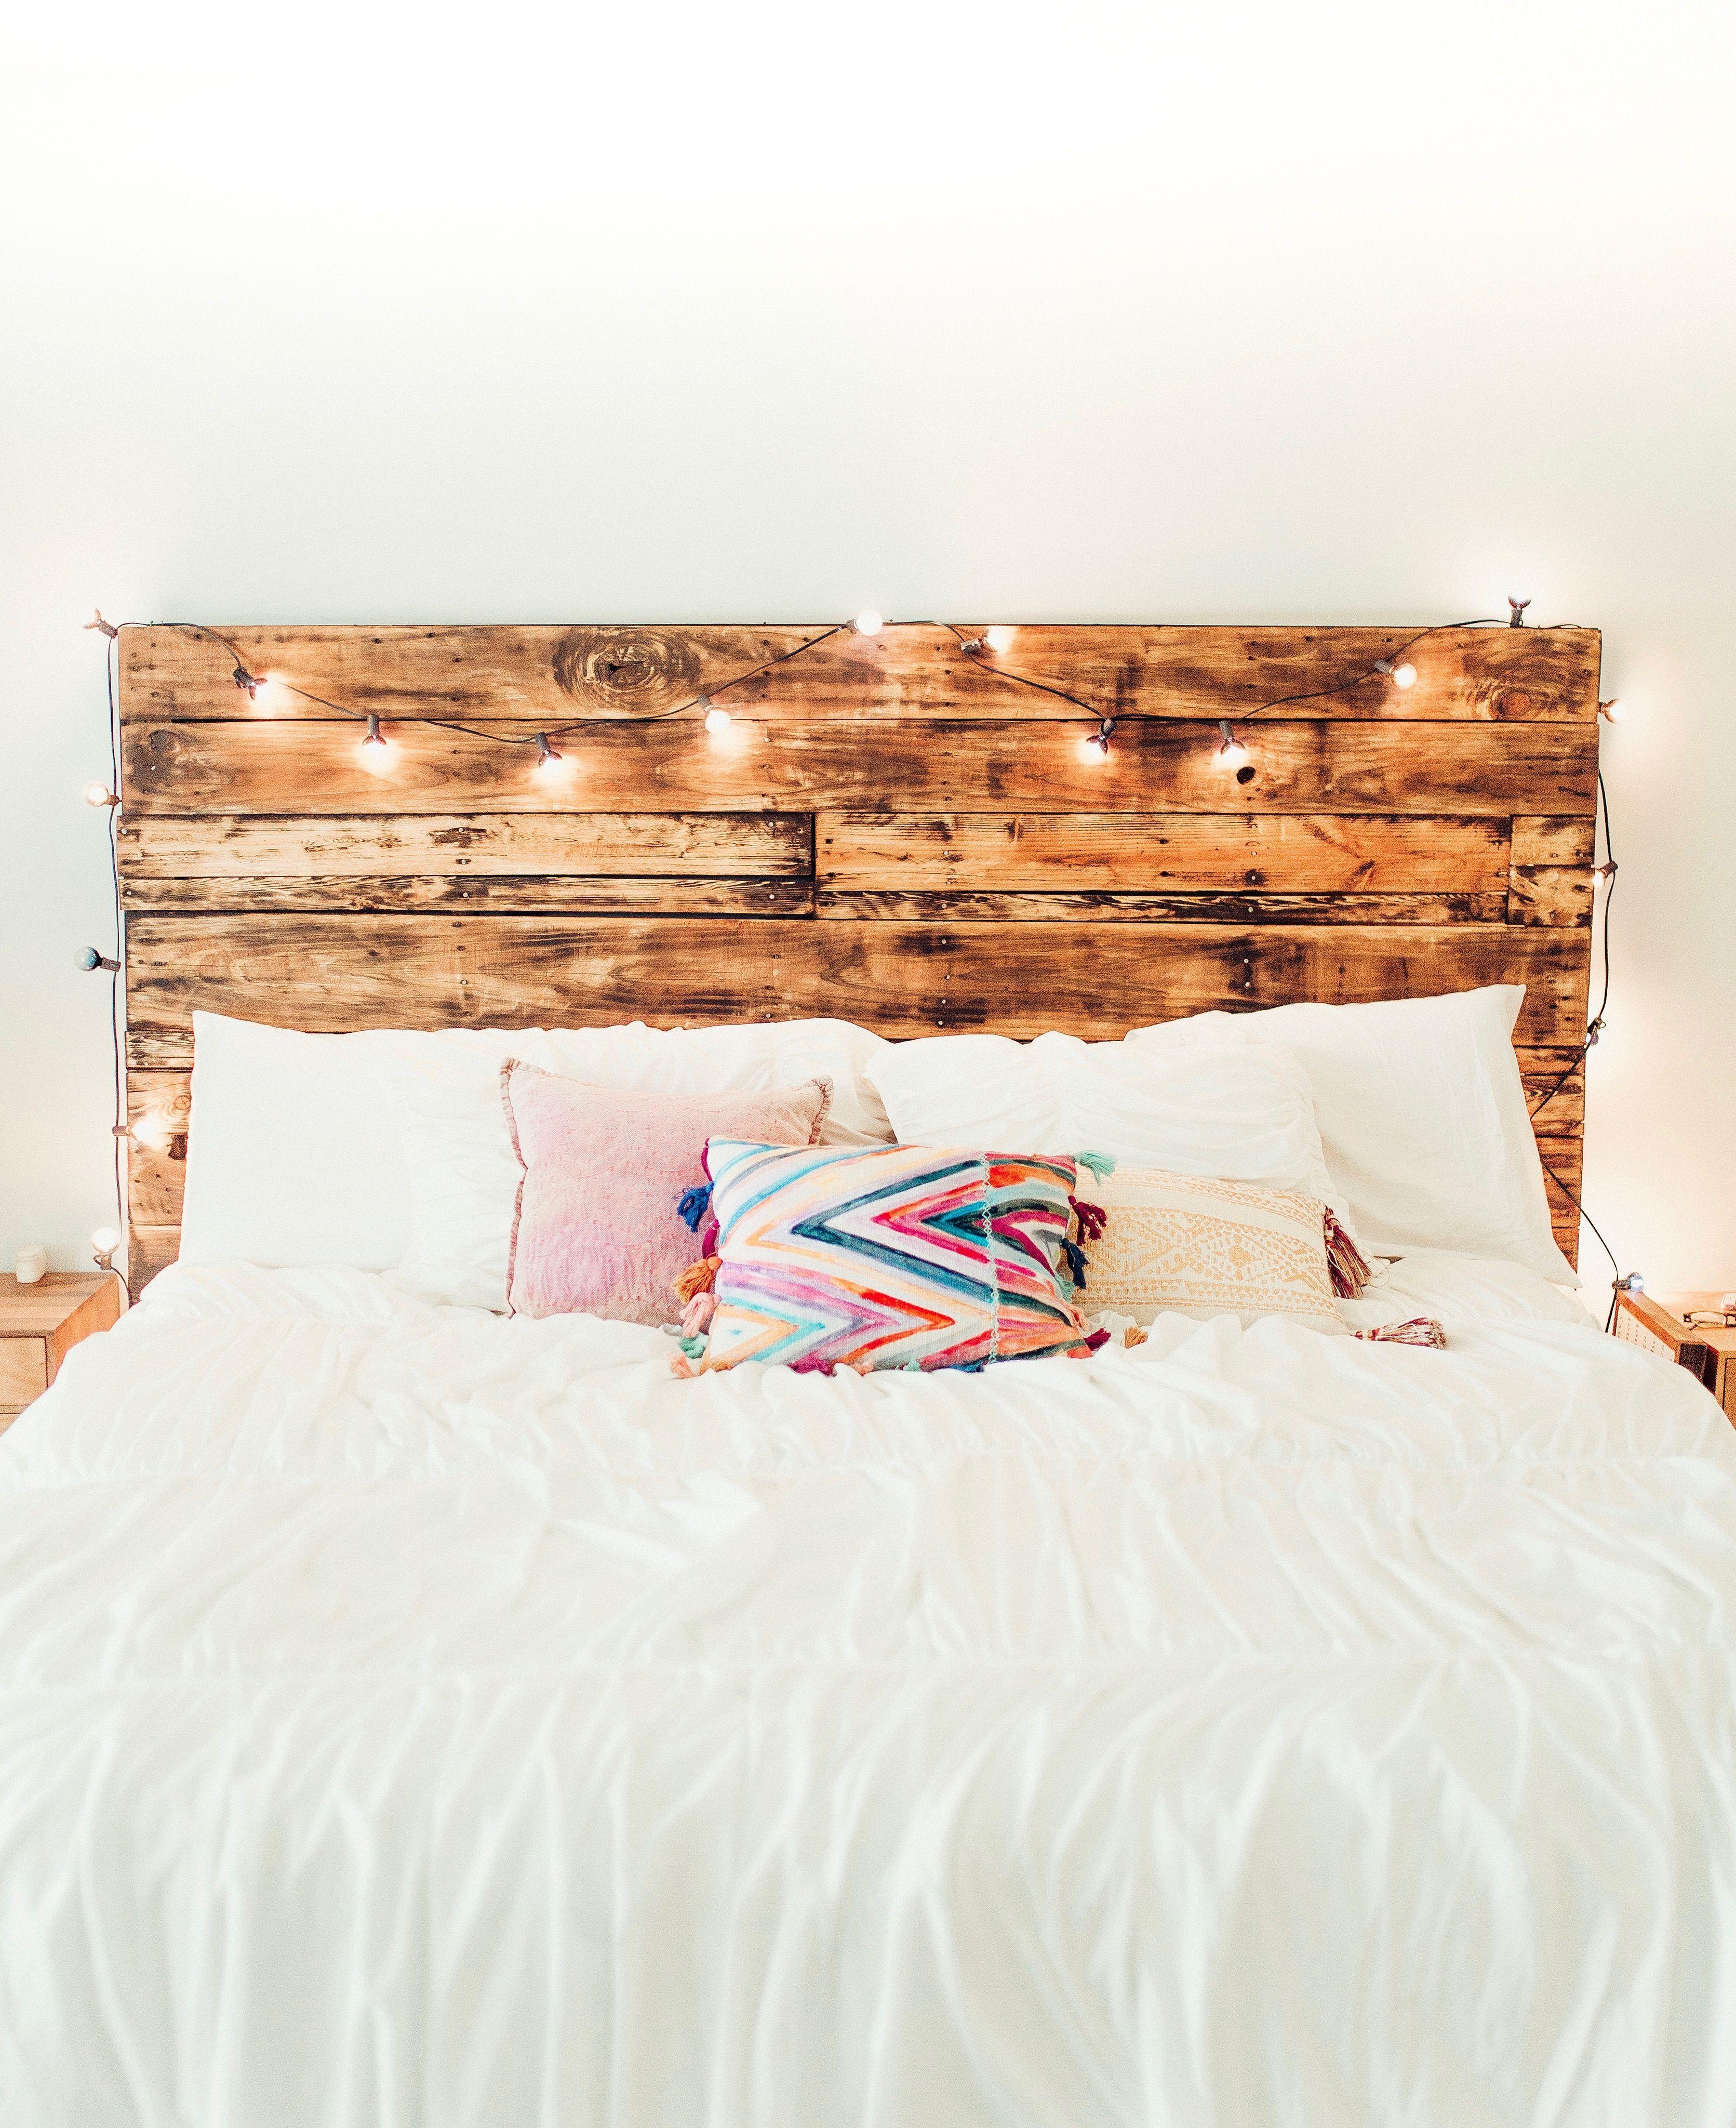 How To Make A DIY Pallet Headboard | Bohemian Farmhouse Decor |  Anthropologie Bedroom Inspiration |